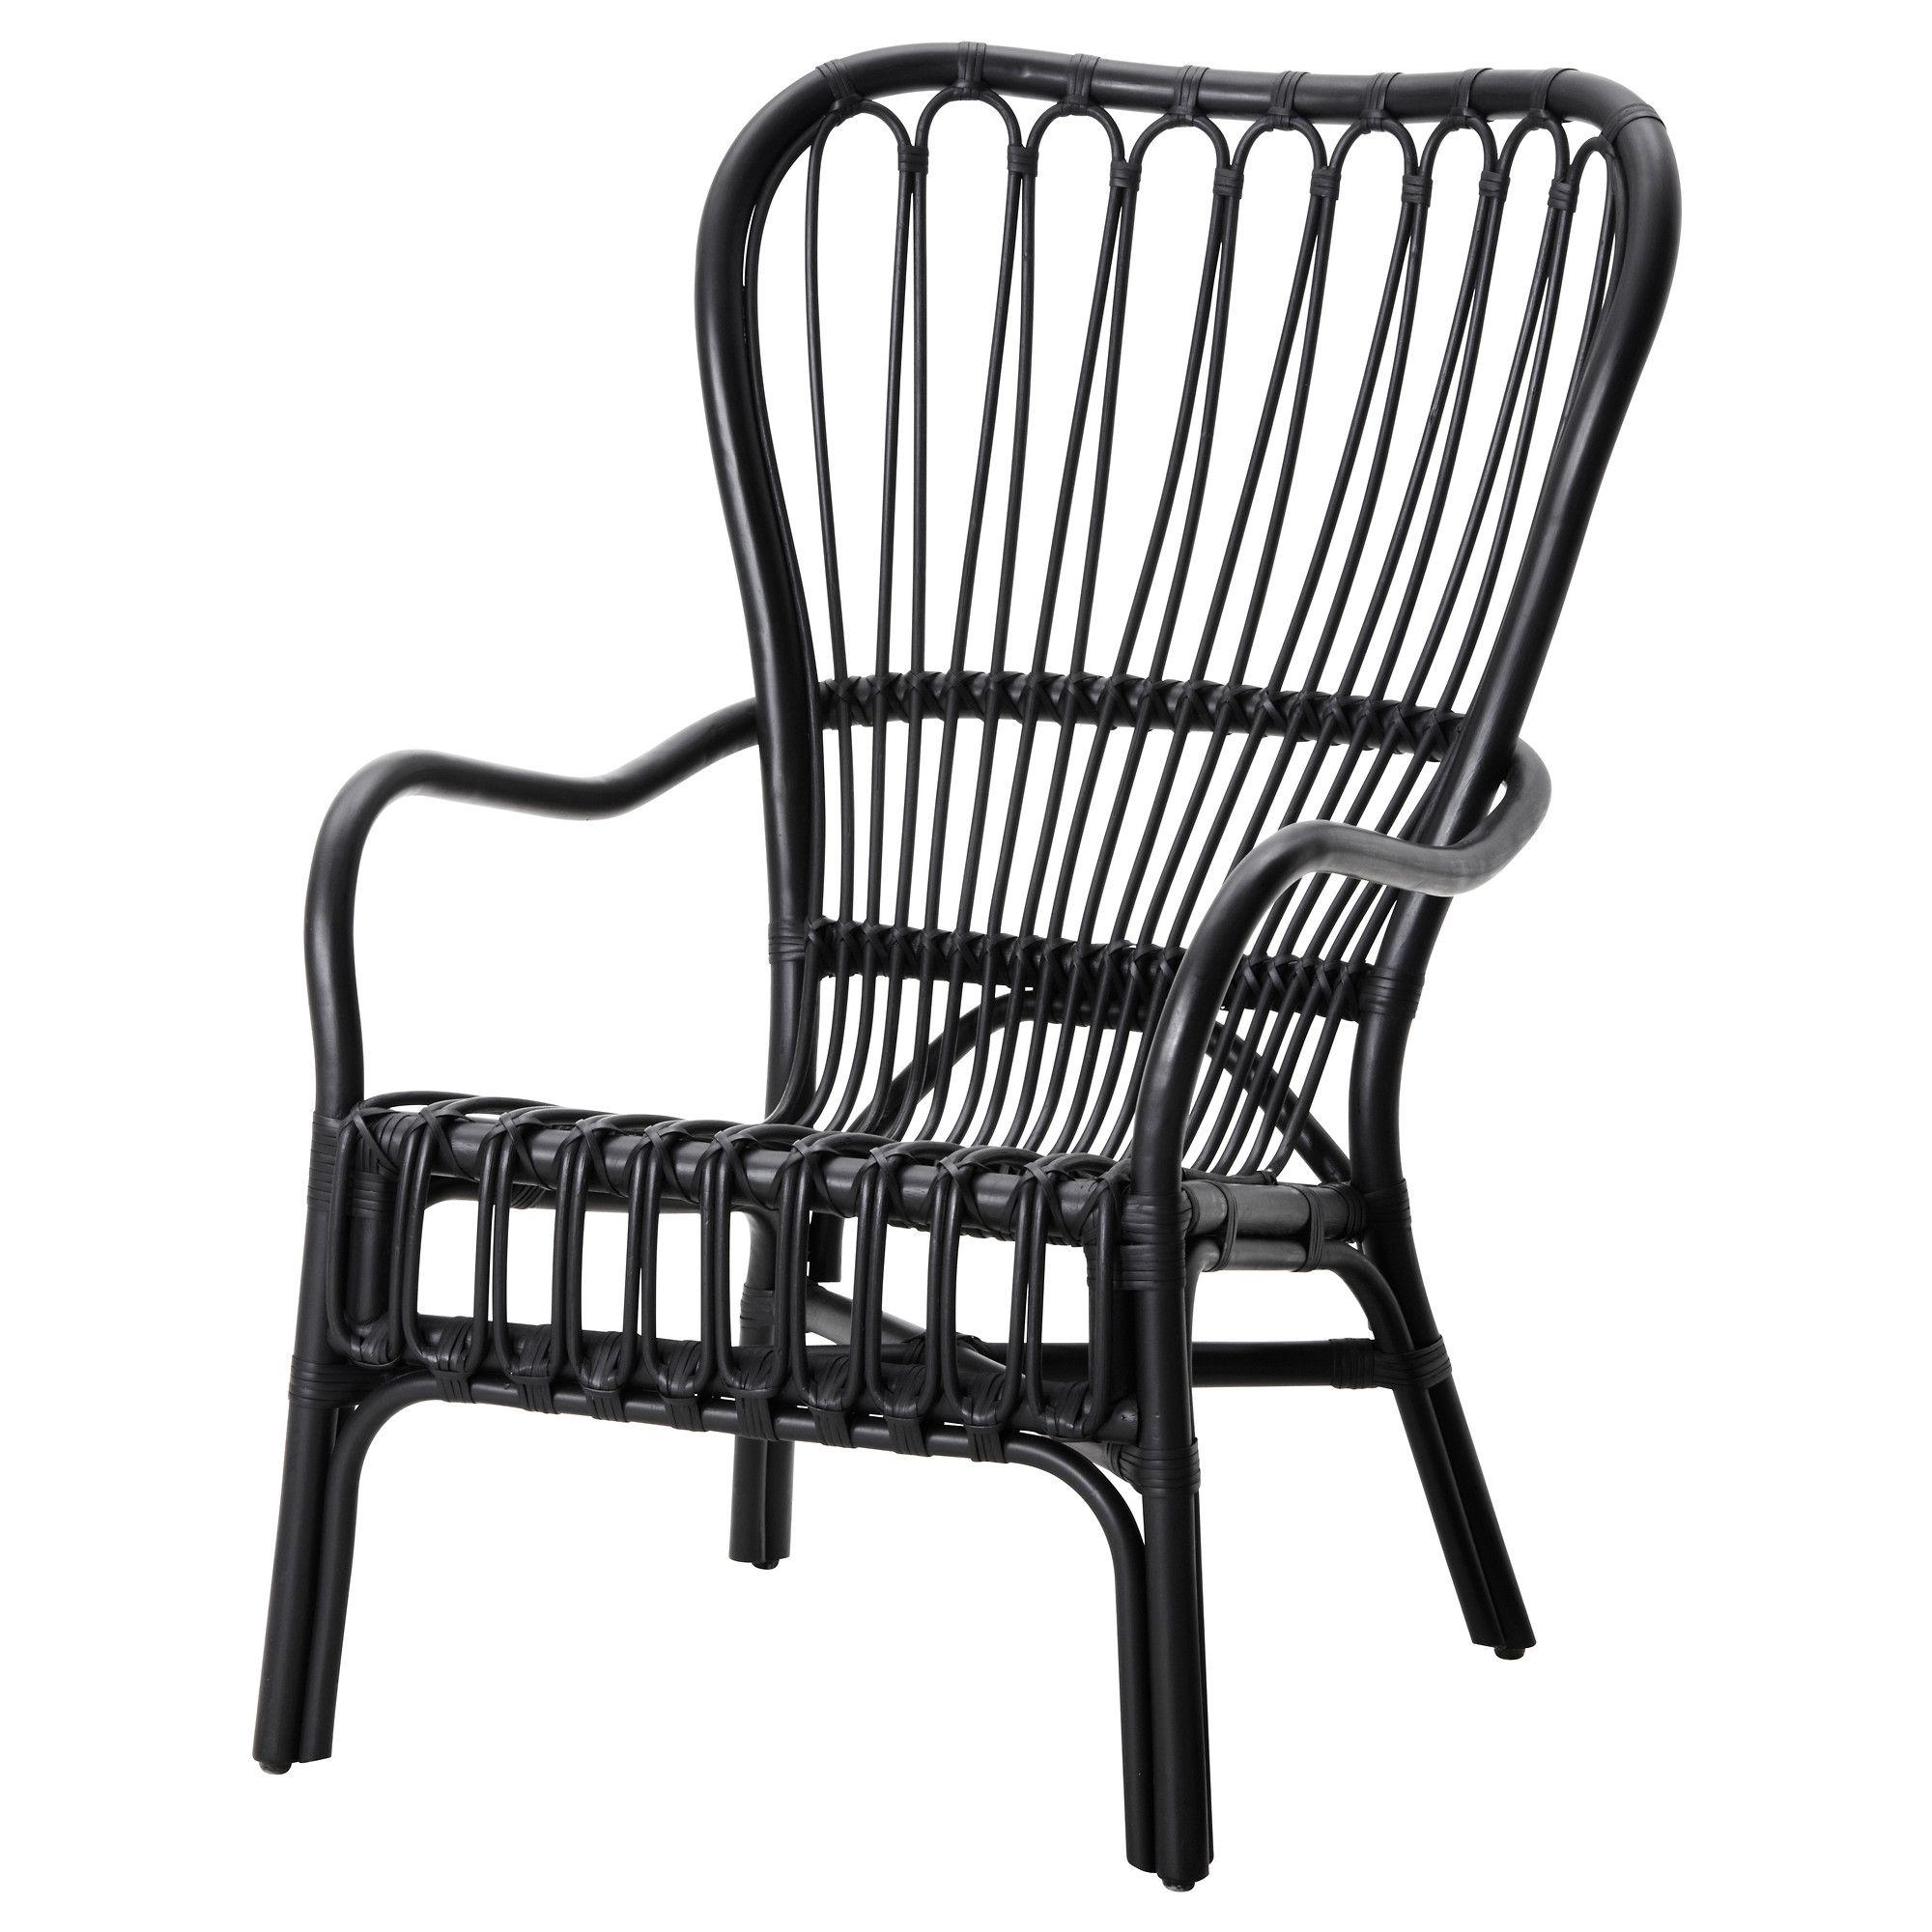 STORSELE Armchair, black, rattan Armchairs, Rattan and Porch